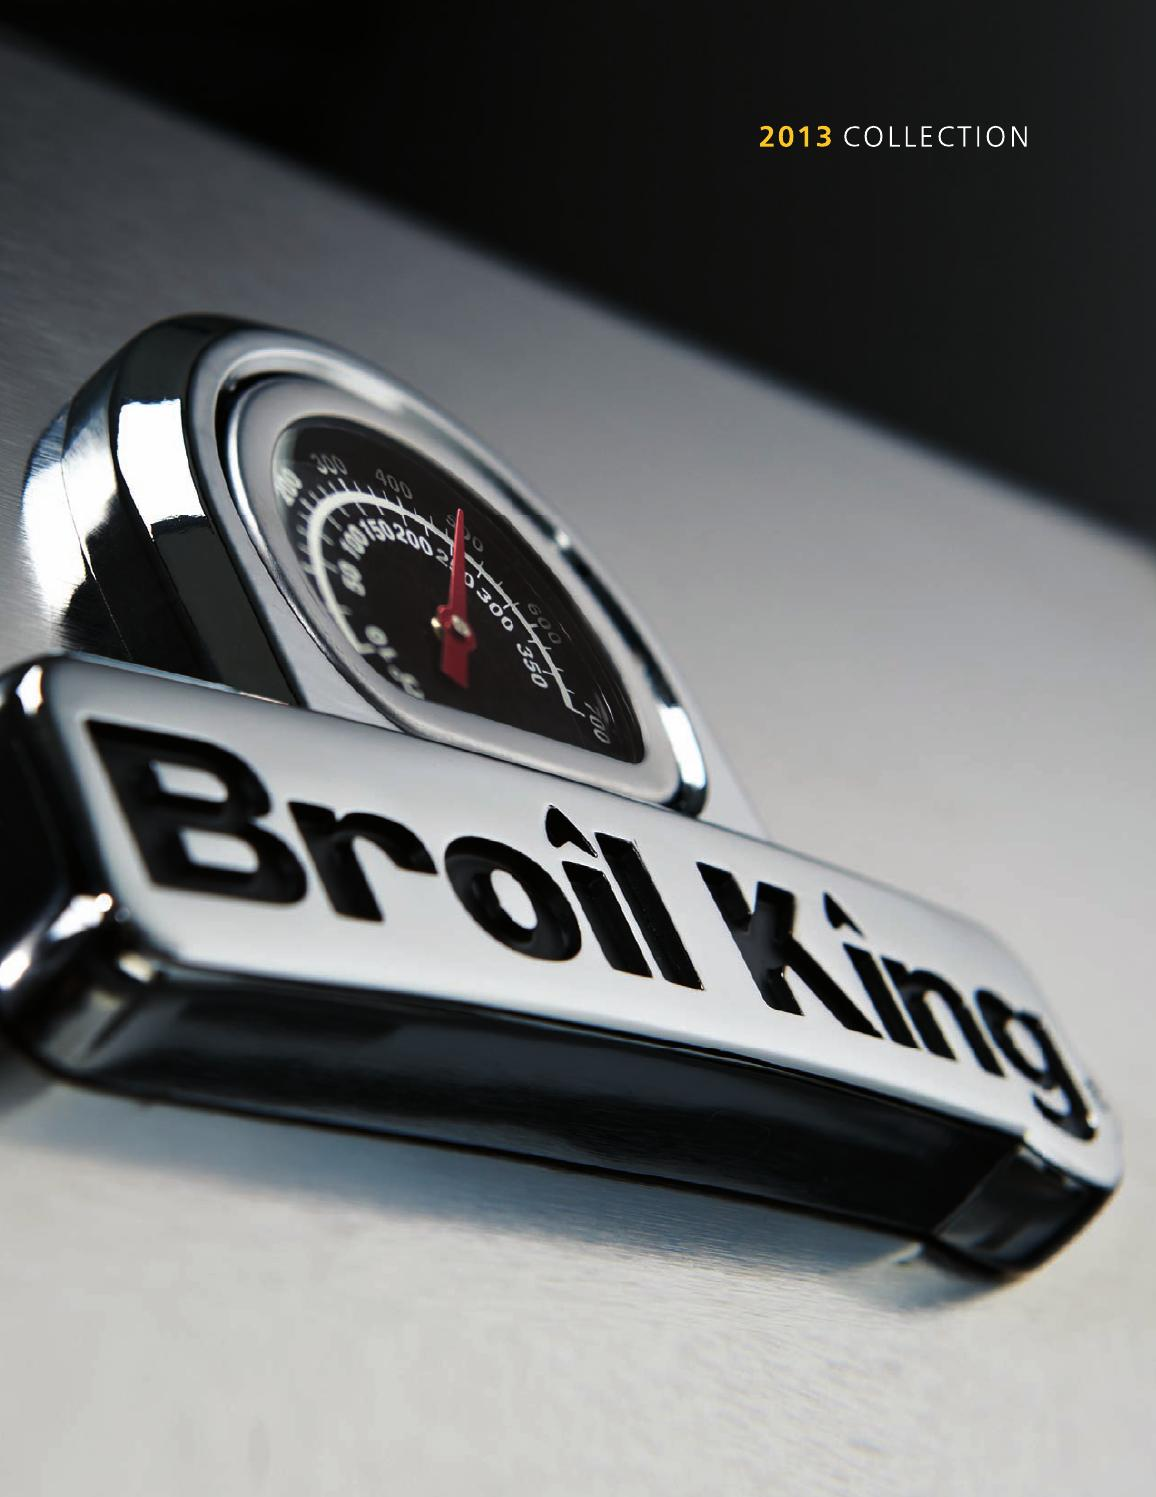 Broil King KA5542 Cast Iron Griddle Onward Manufacturing